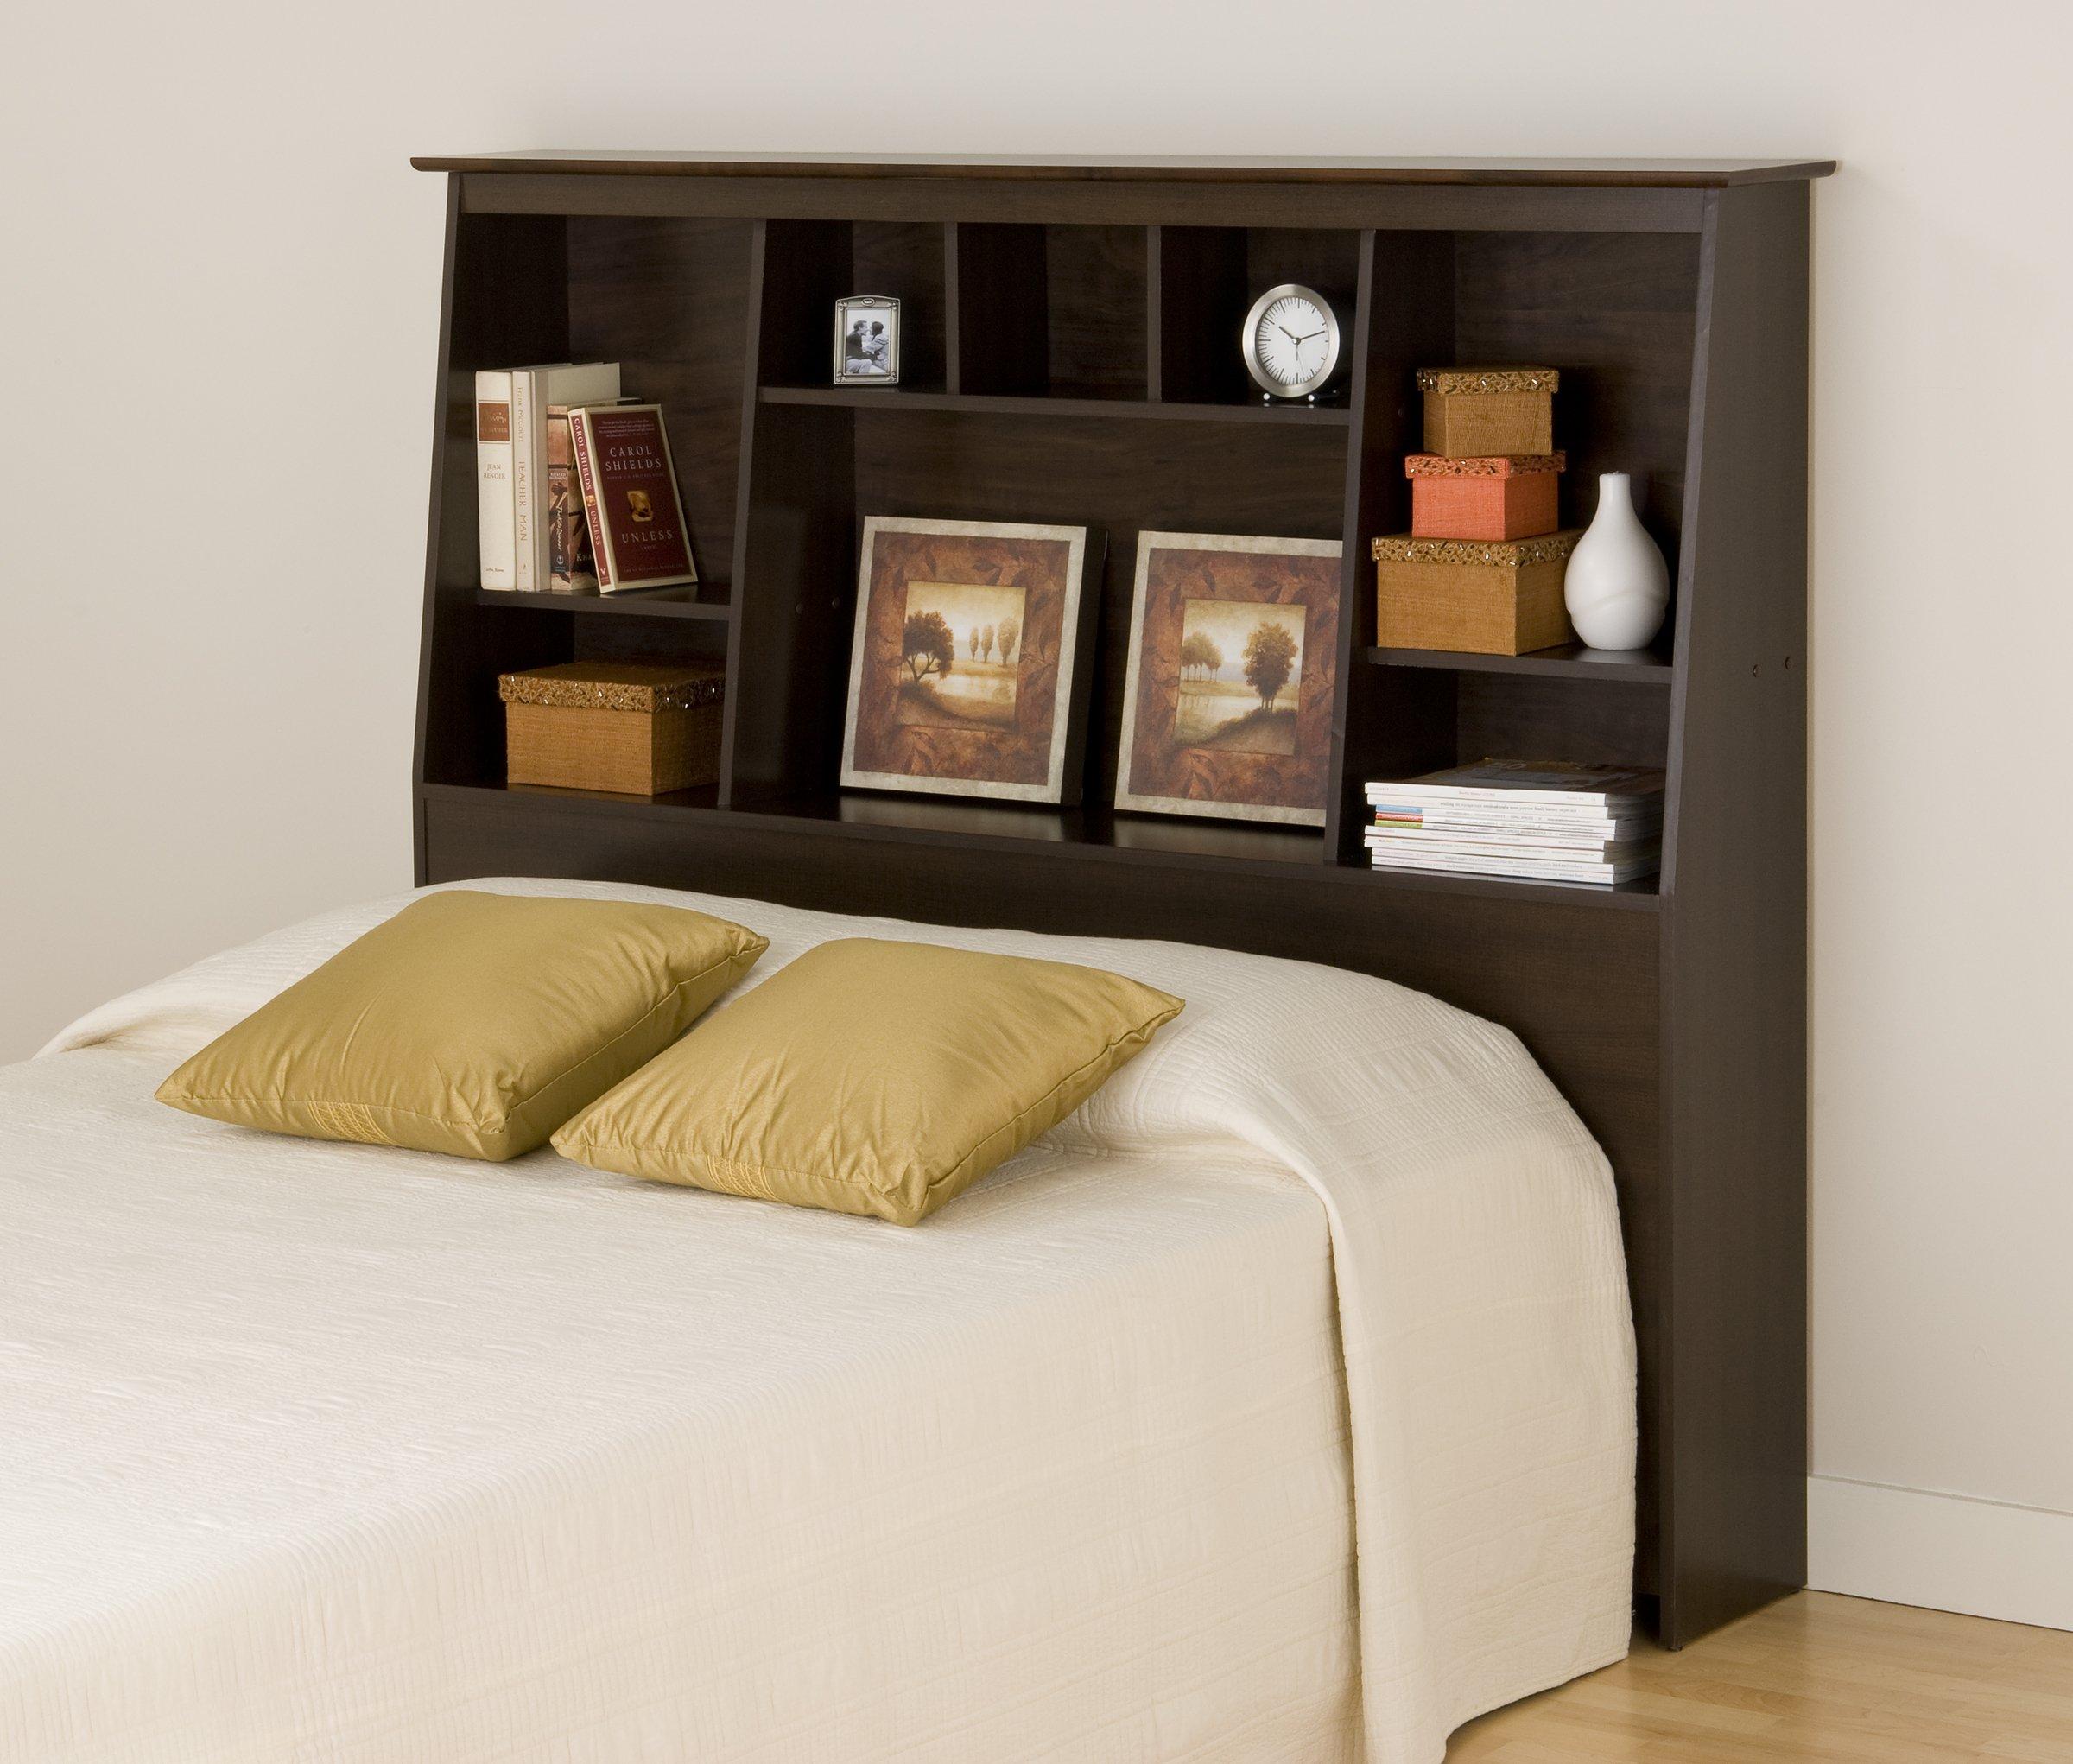 Prepac Tall Slant-Back Bookcase Headboard, Espresso, Full/Queen by Prepac